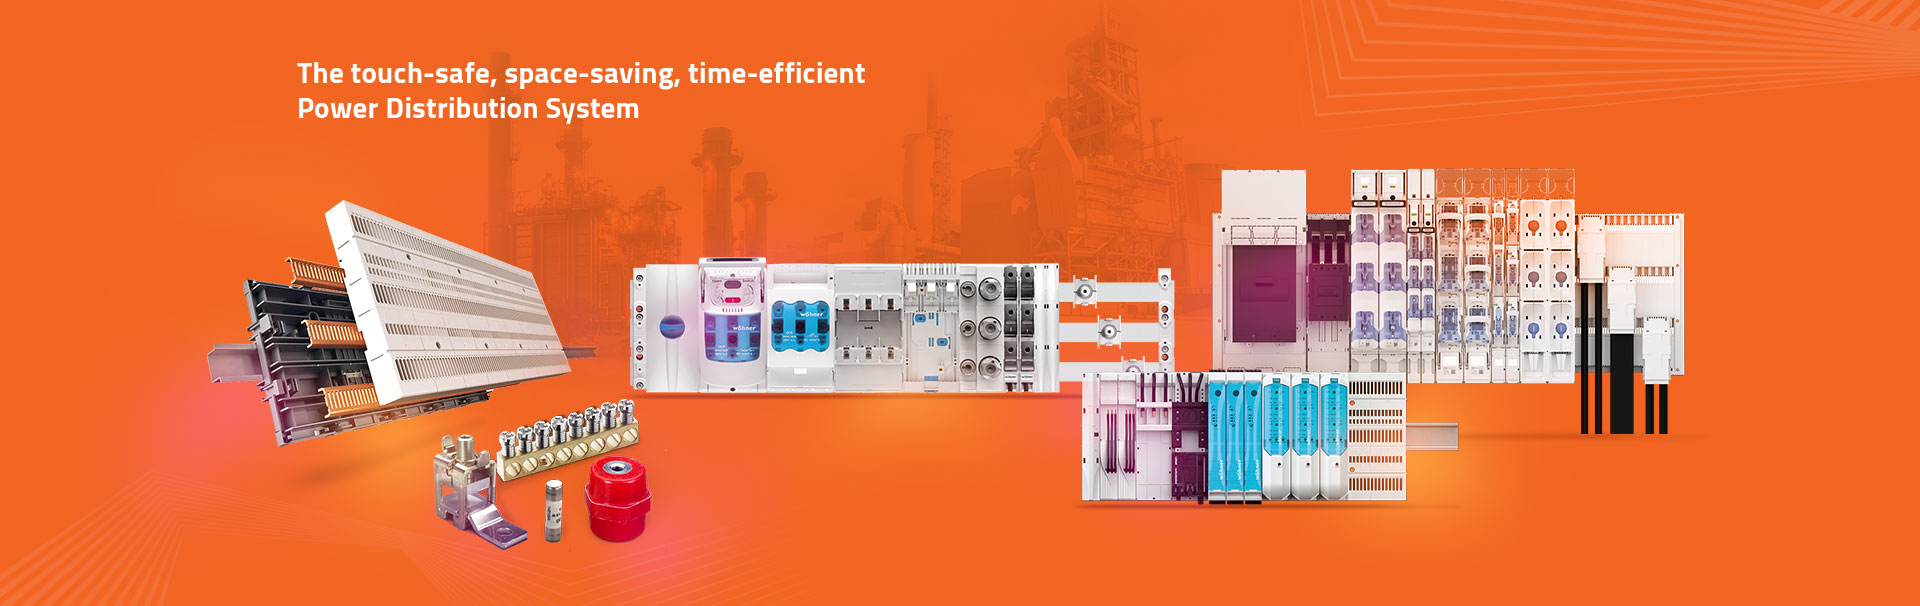 Busbar System and IEC 61439 Standards